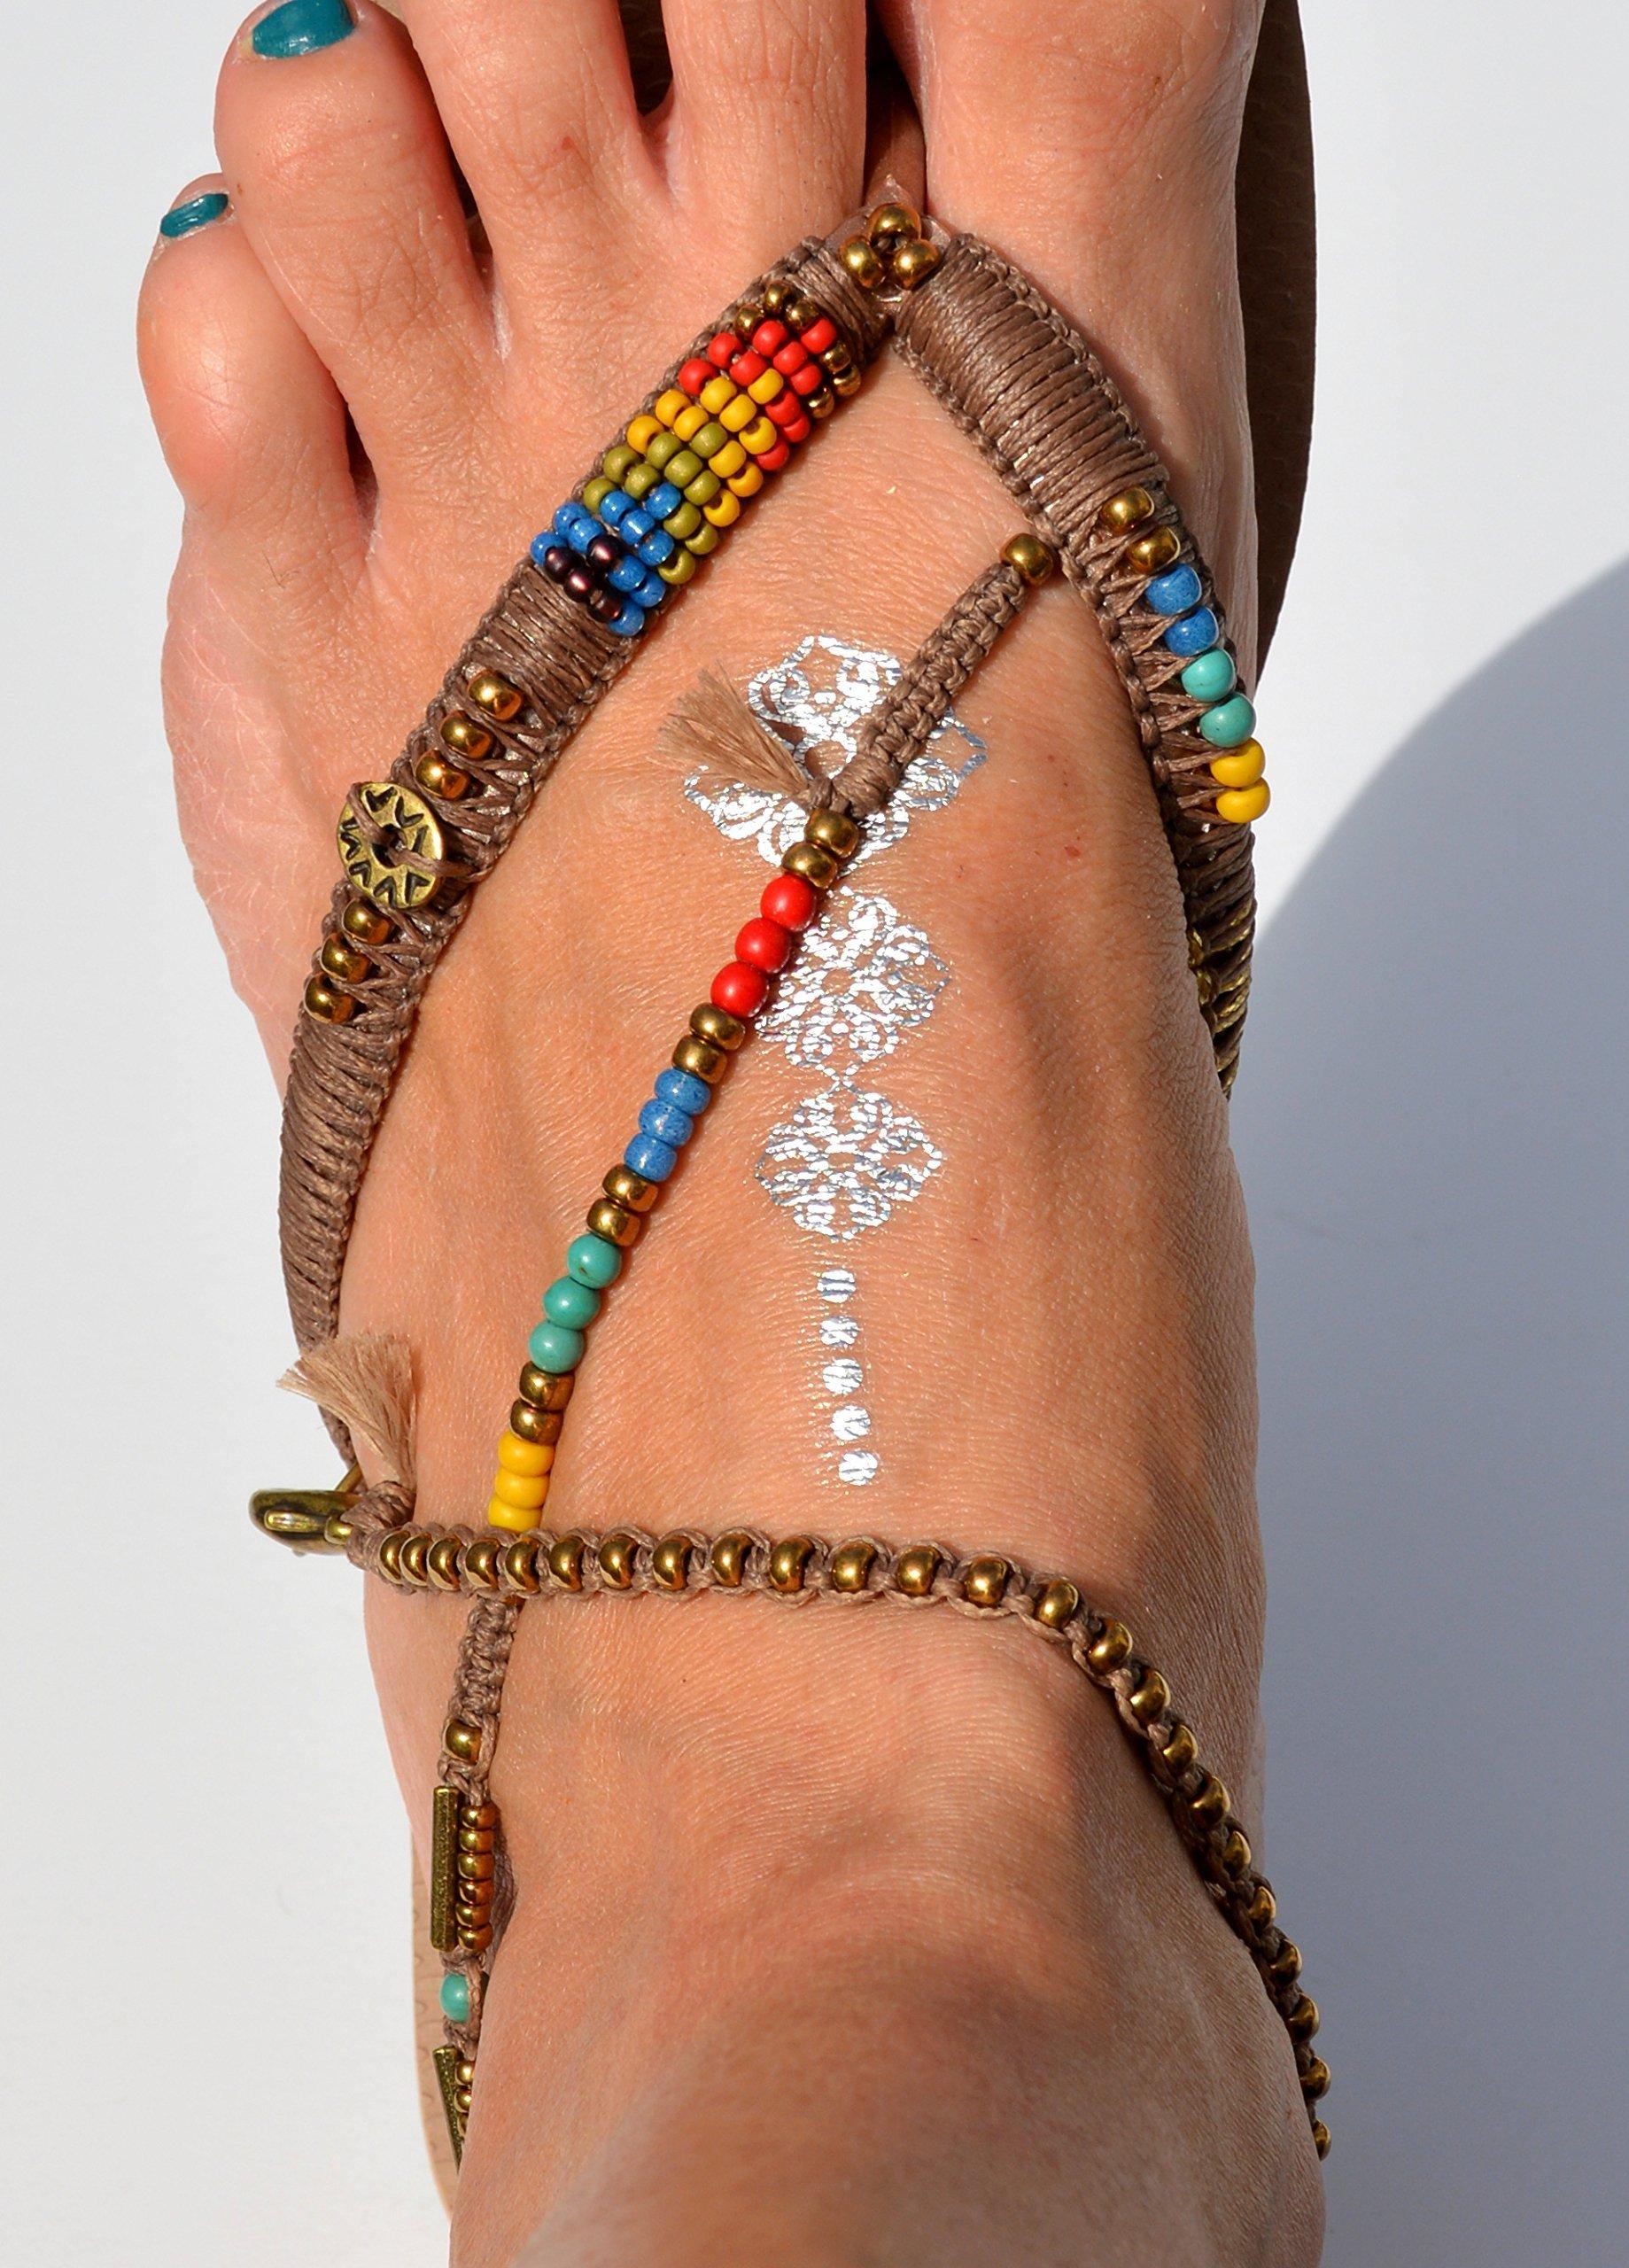 Unique Women's Sandals, Boho Vegan Flat Beaded Shoes, Hippie Decorated Beach Flip Flops with Anklet, Sizes 5-12 US, Handmade Designer